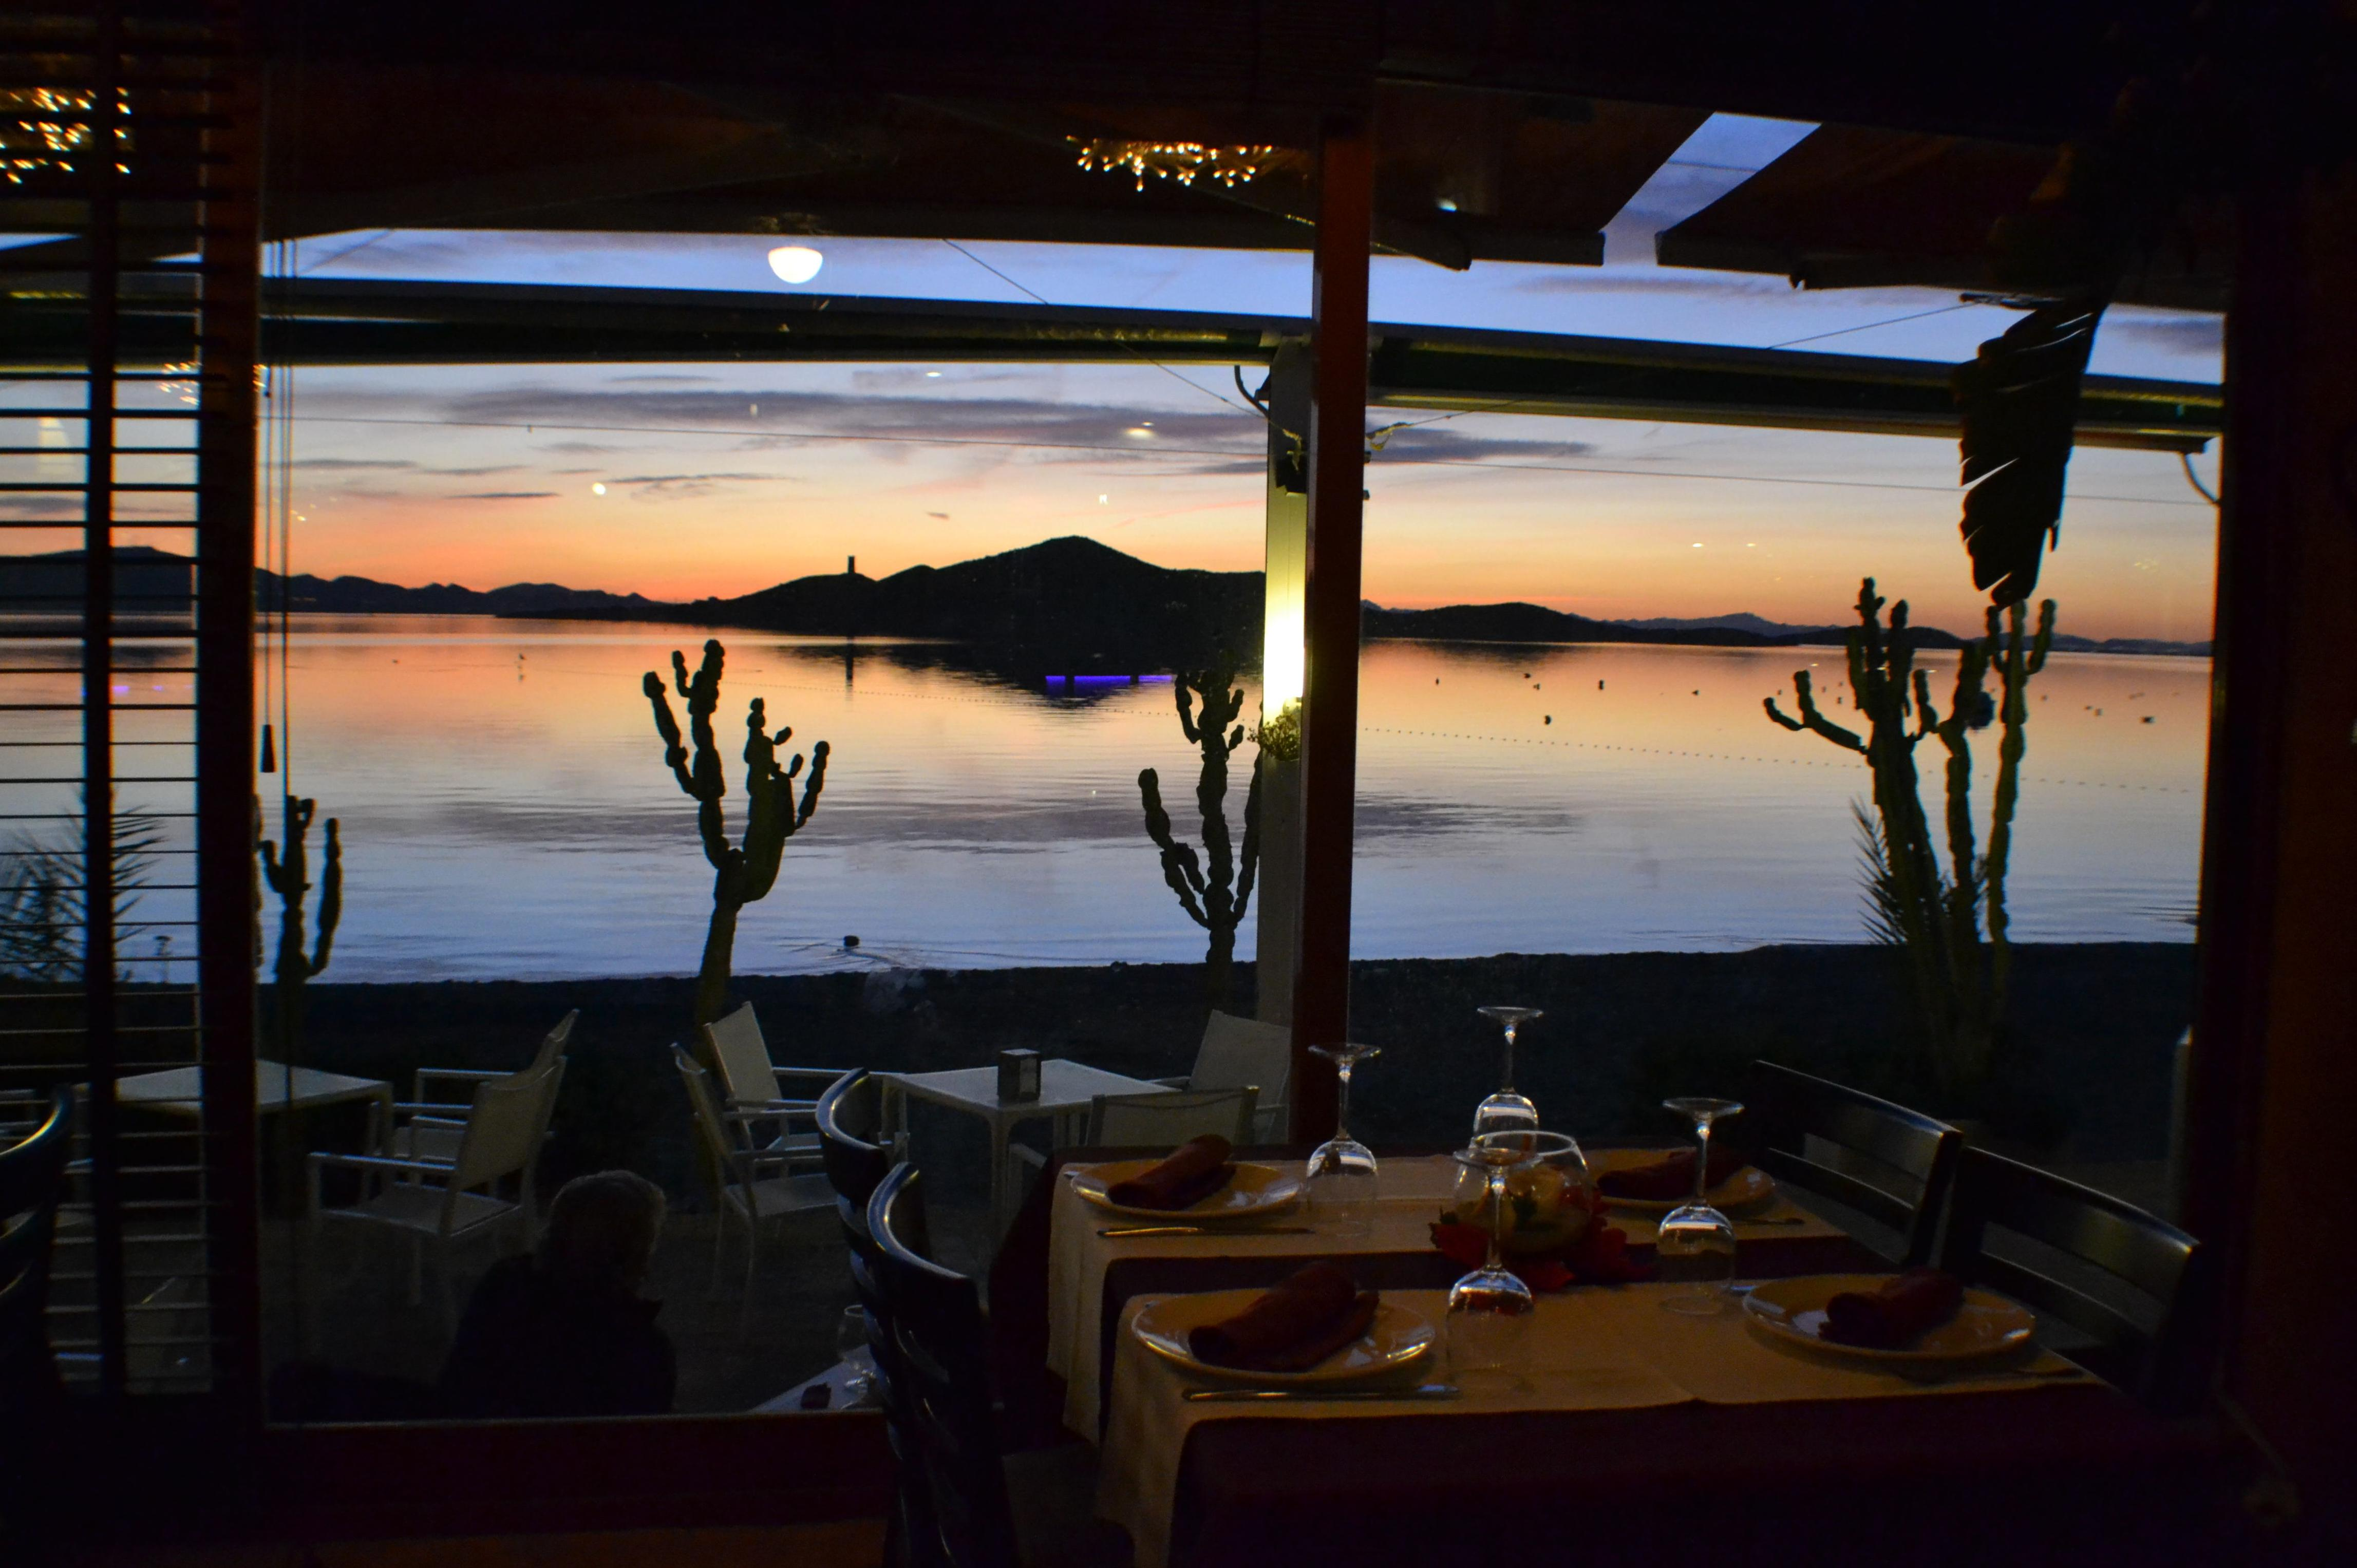 Foto 13 de Cocina mediterránea en La Manga del Mar Menor | ÁREA SUNSET